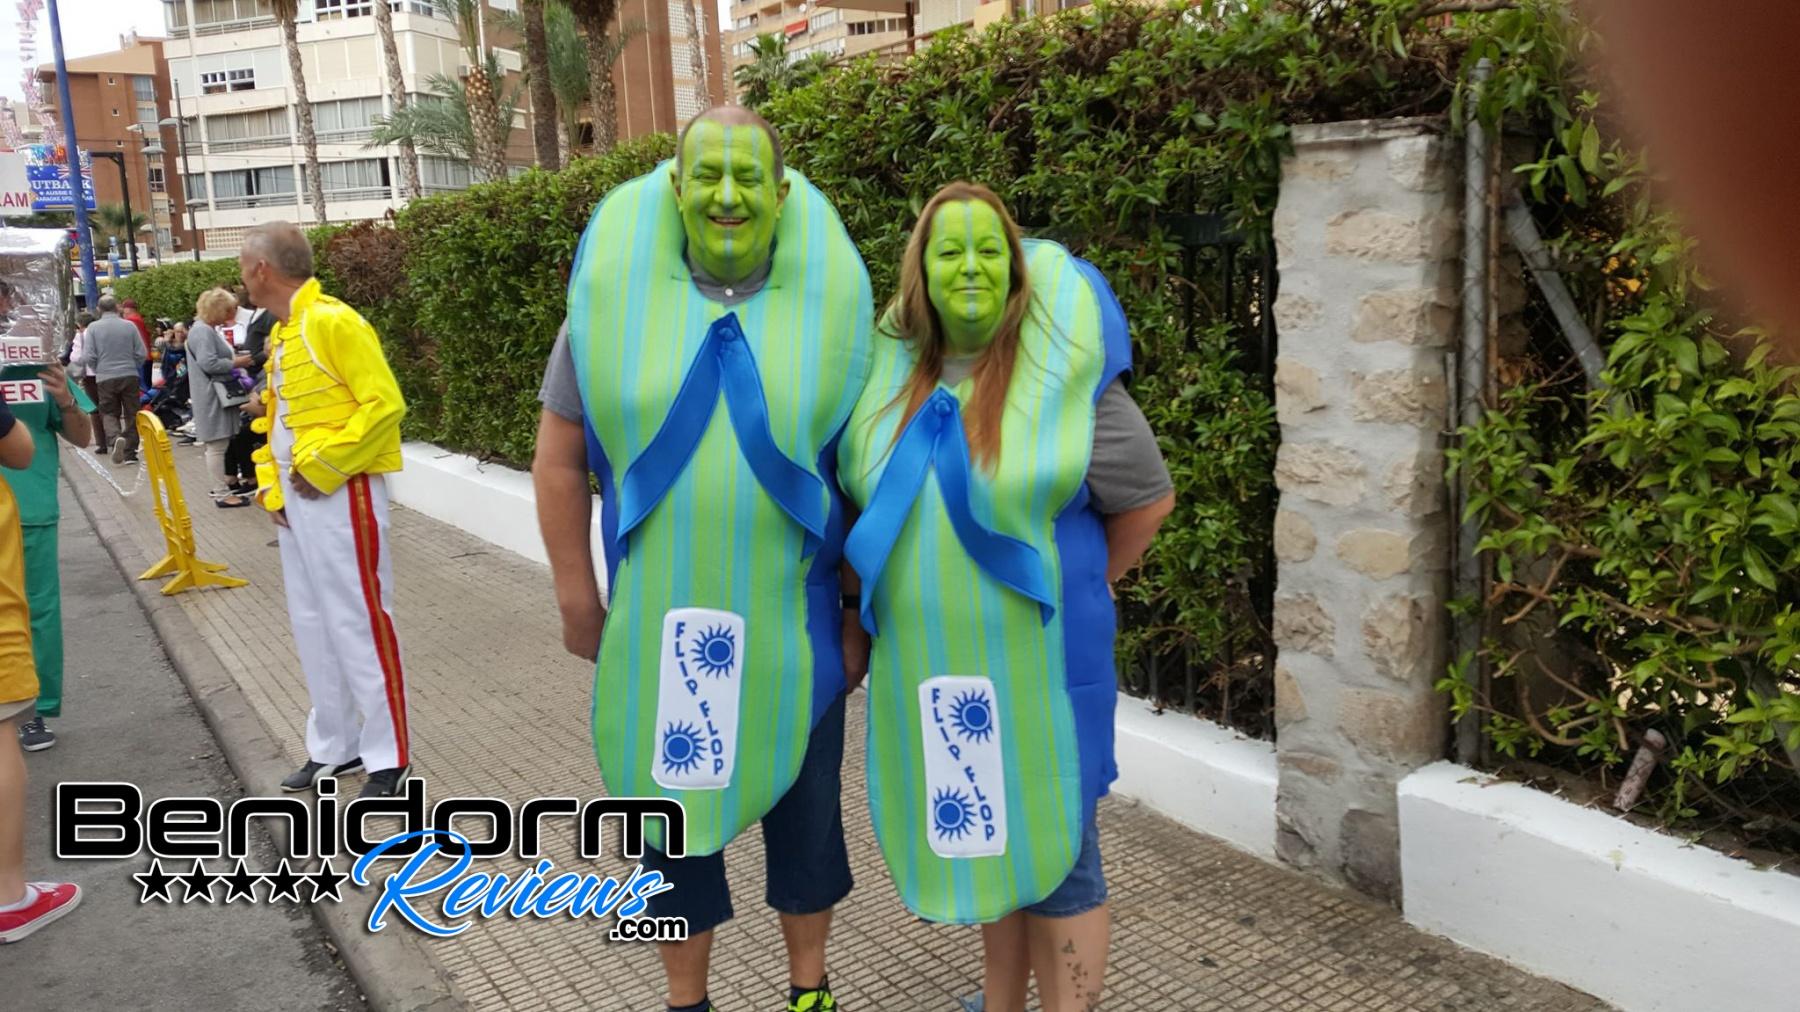 Benidorm-Fiestas-2019-Fancy-Dress-146